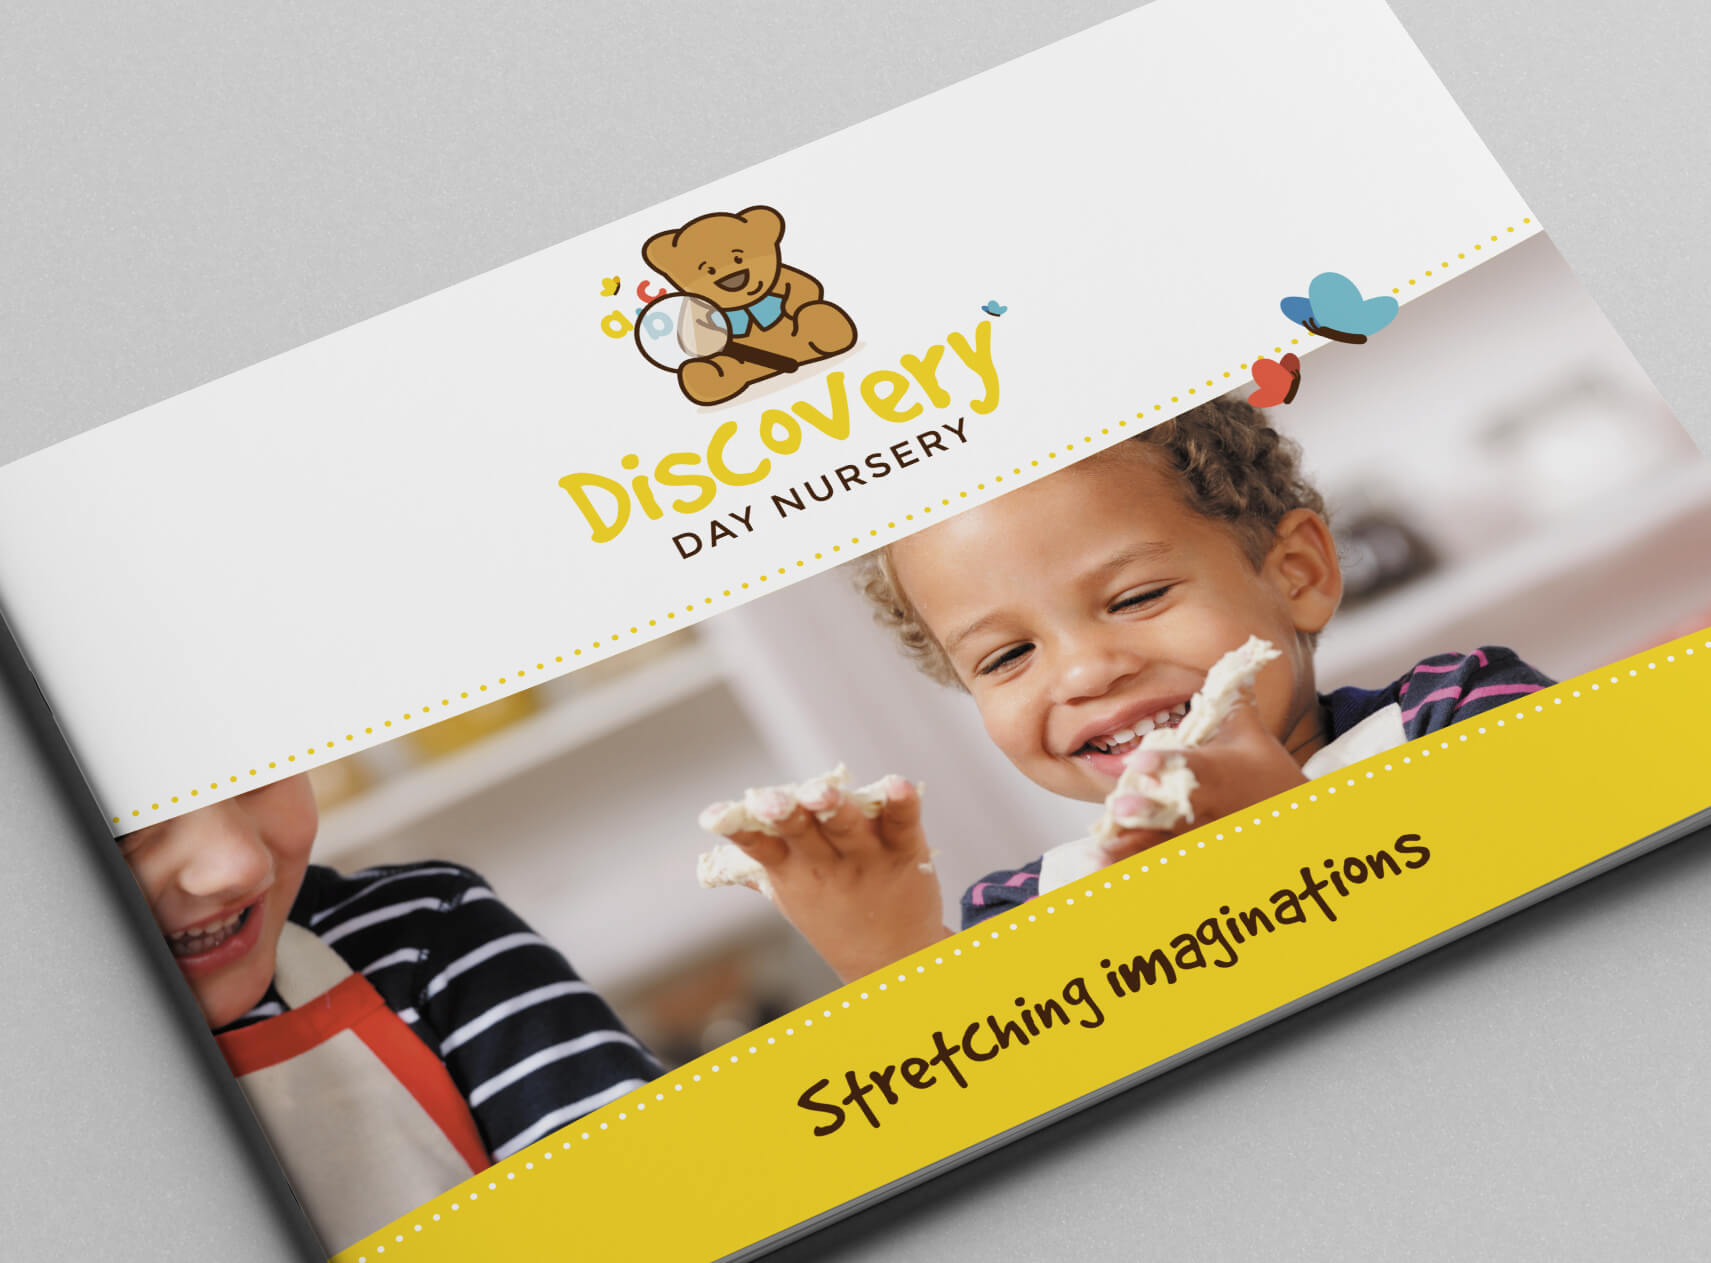 Discovery Day Nursery